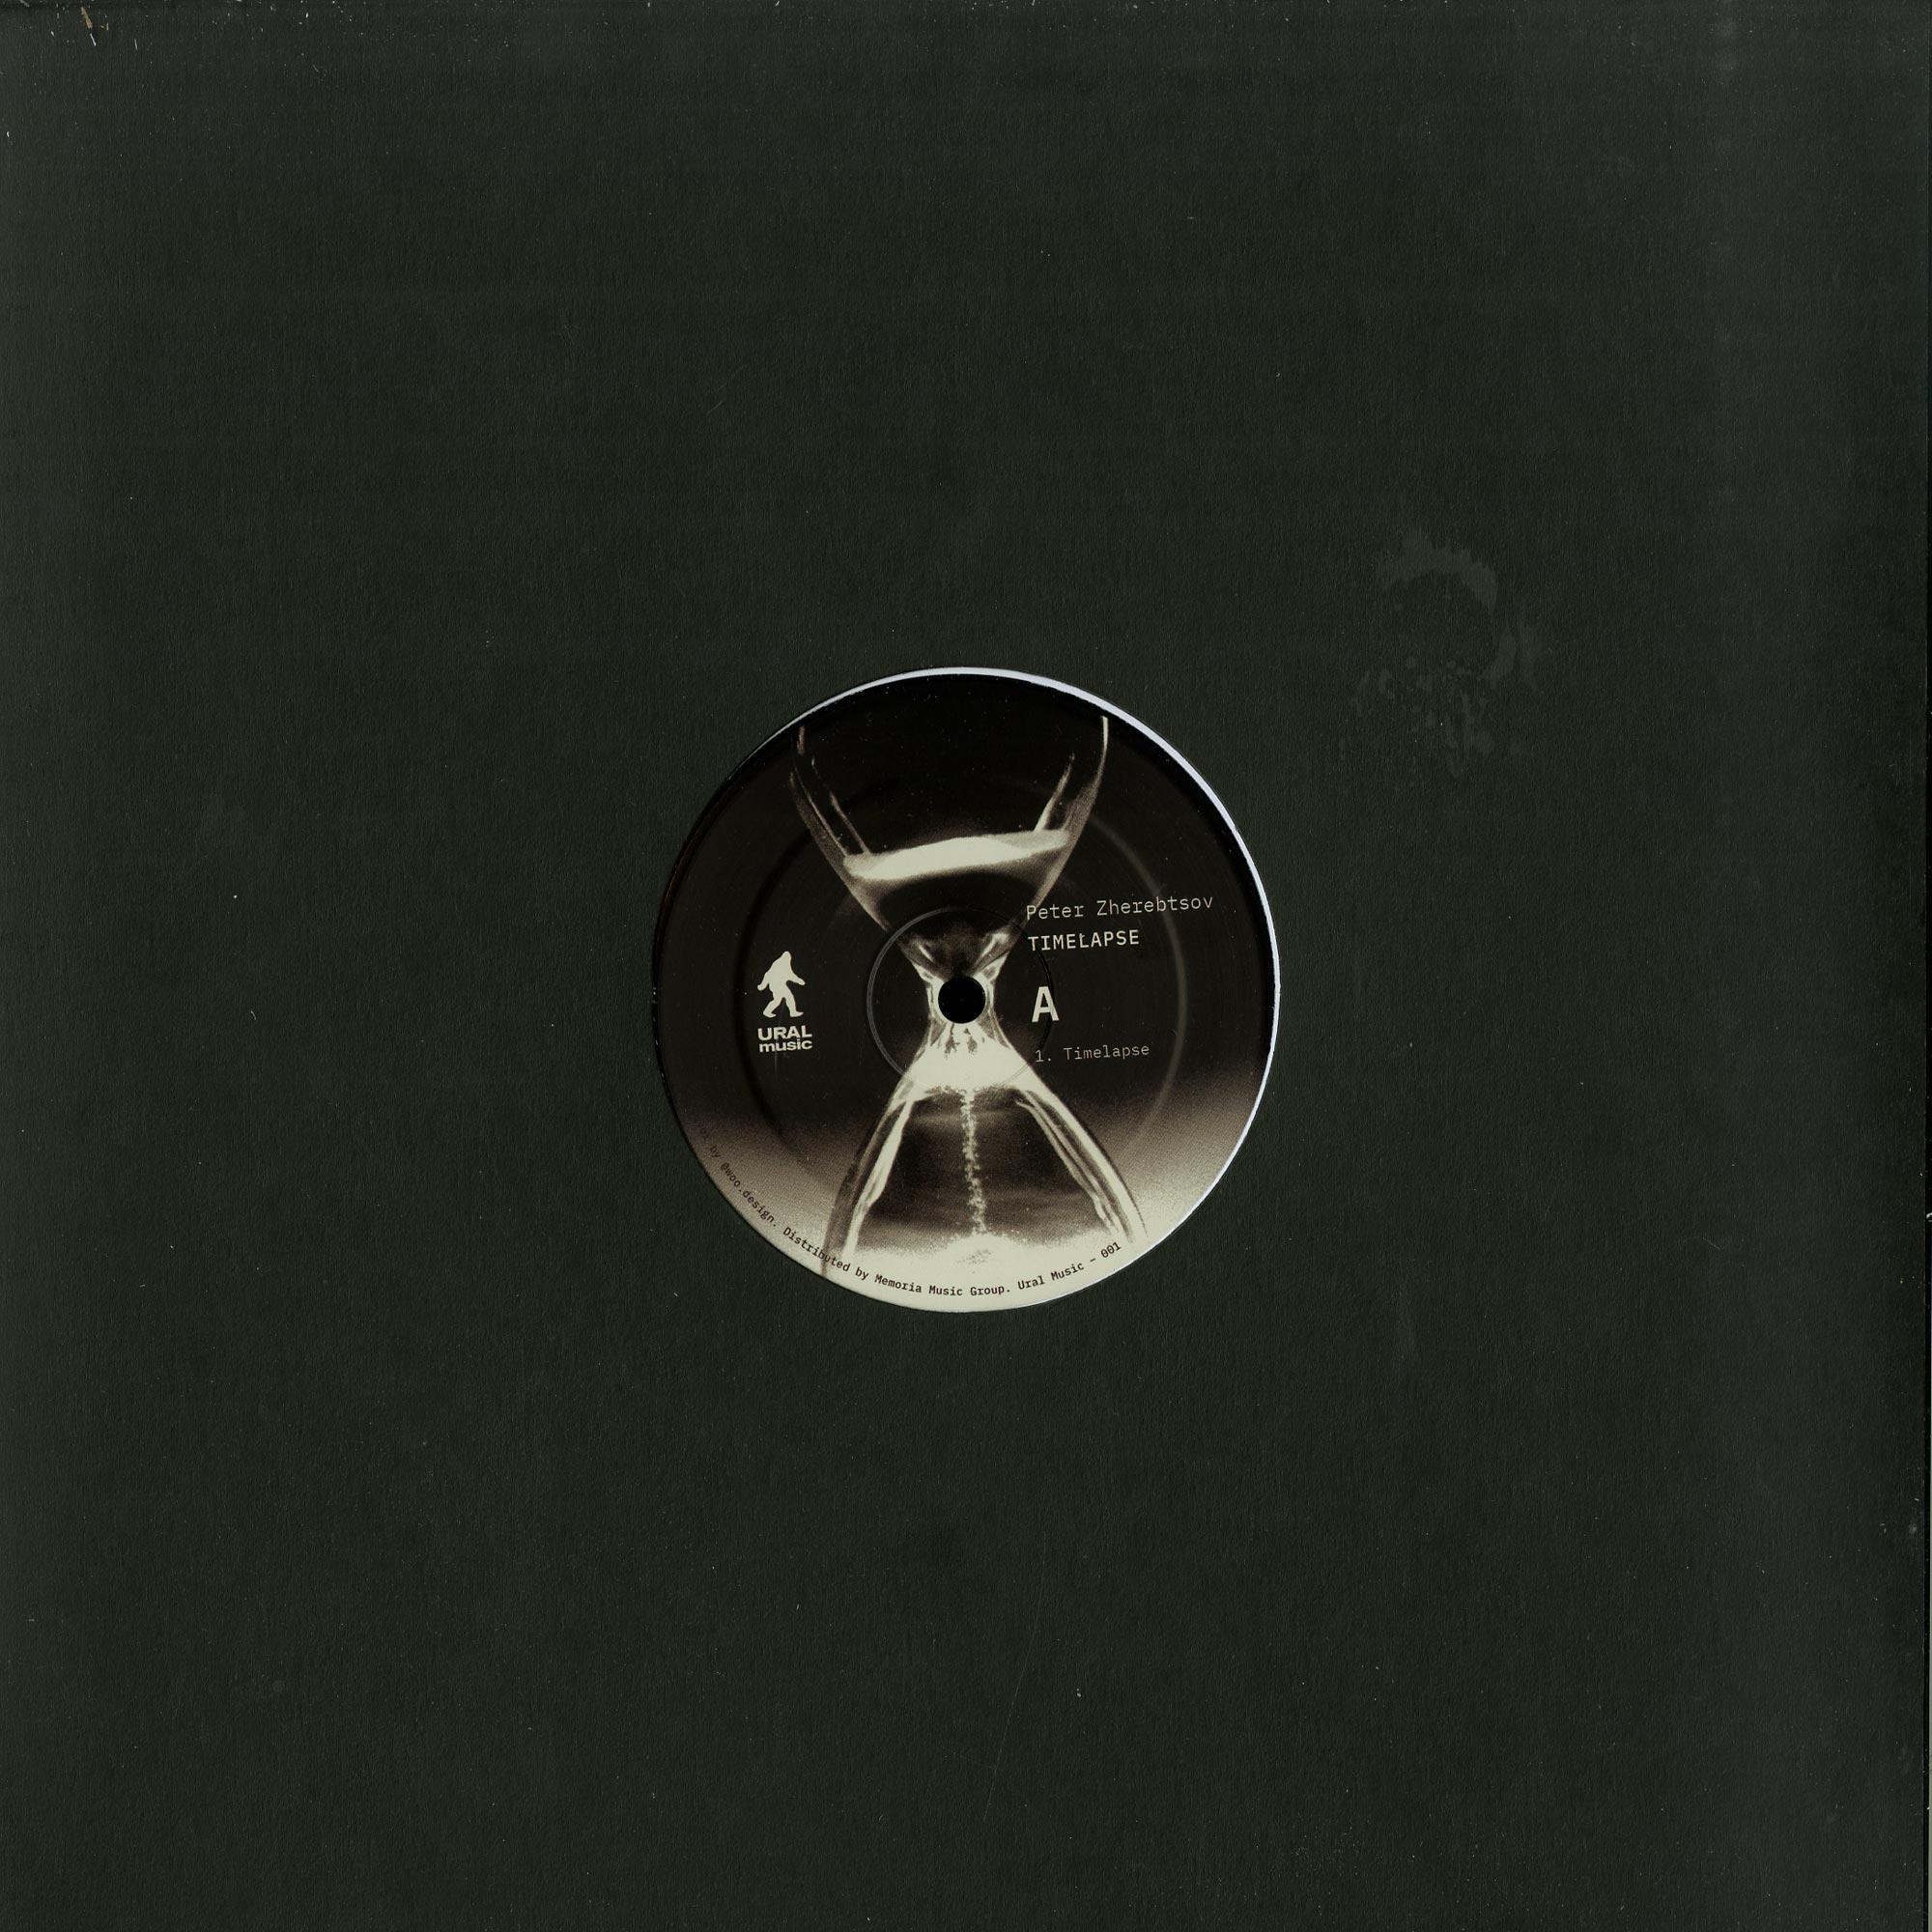 Peter Zherebtsov - TIMELAPSE